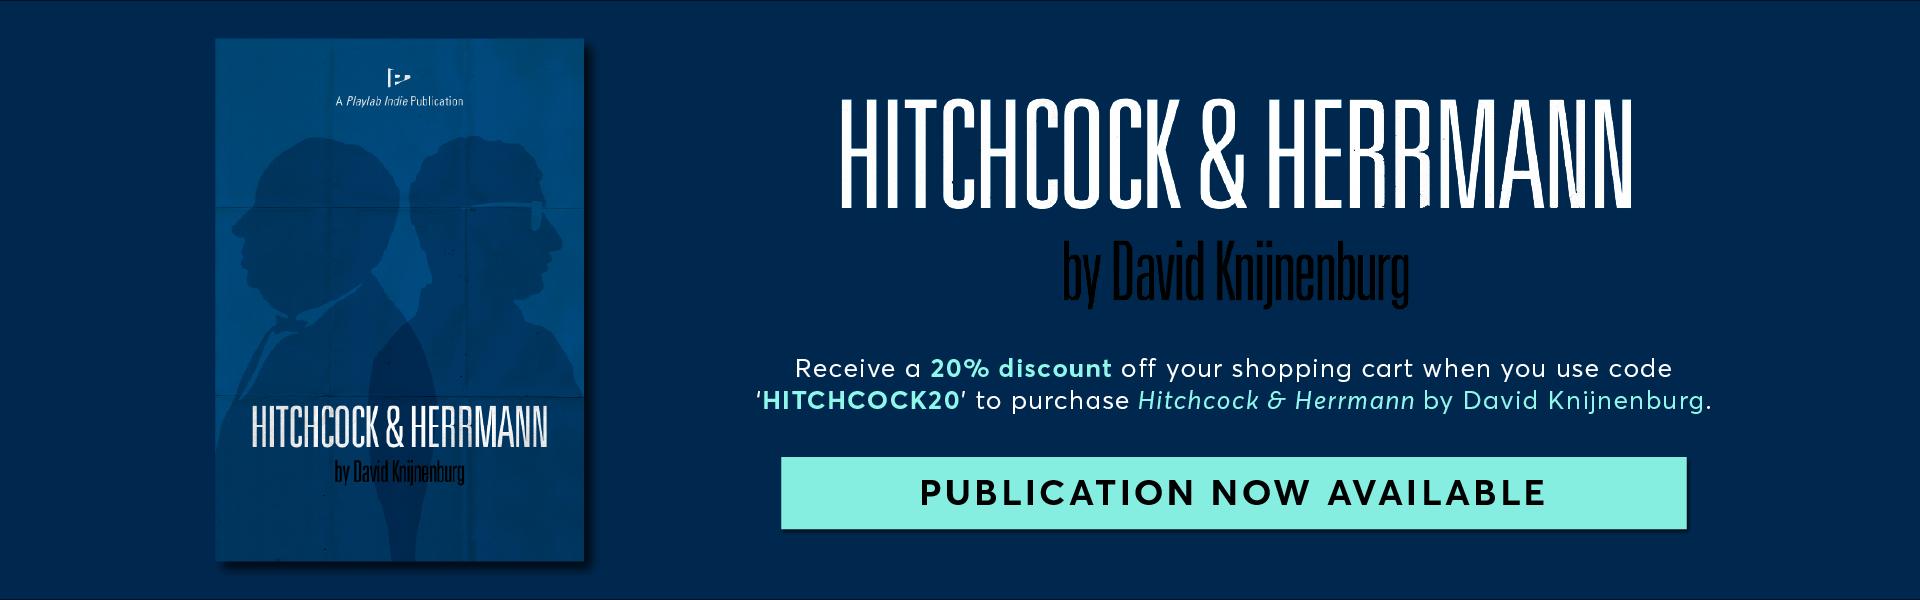 Hitchcock & Herrmann by David Knijnenburg